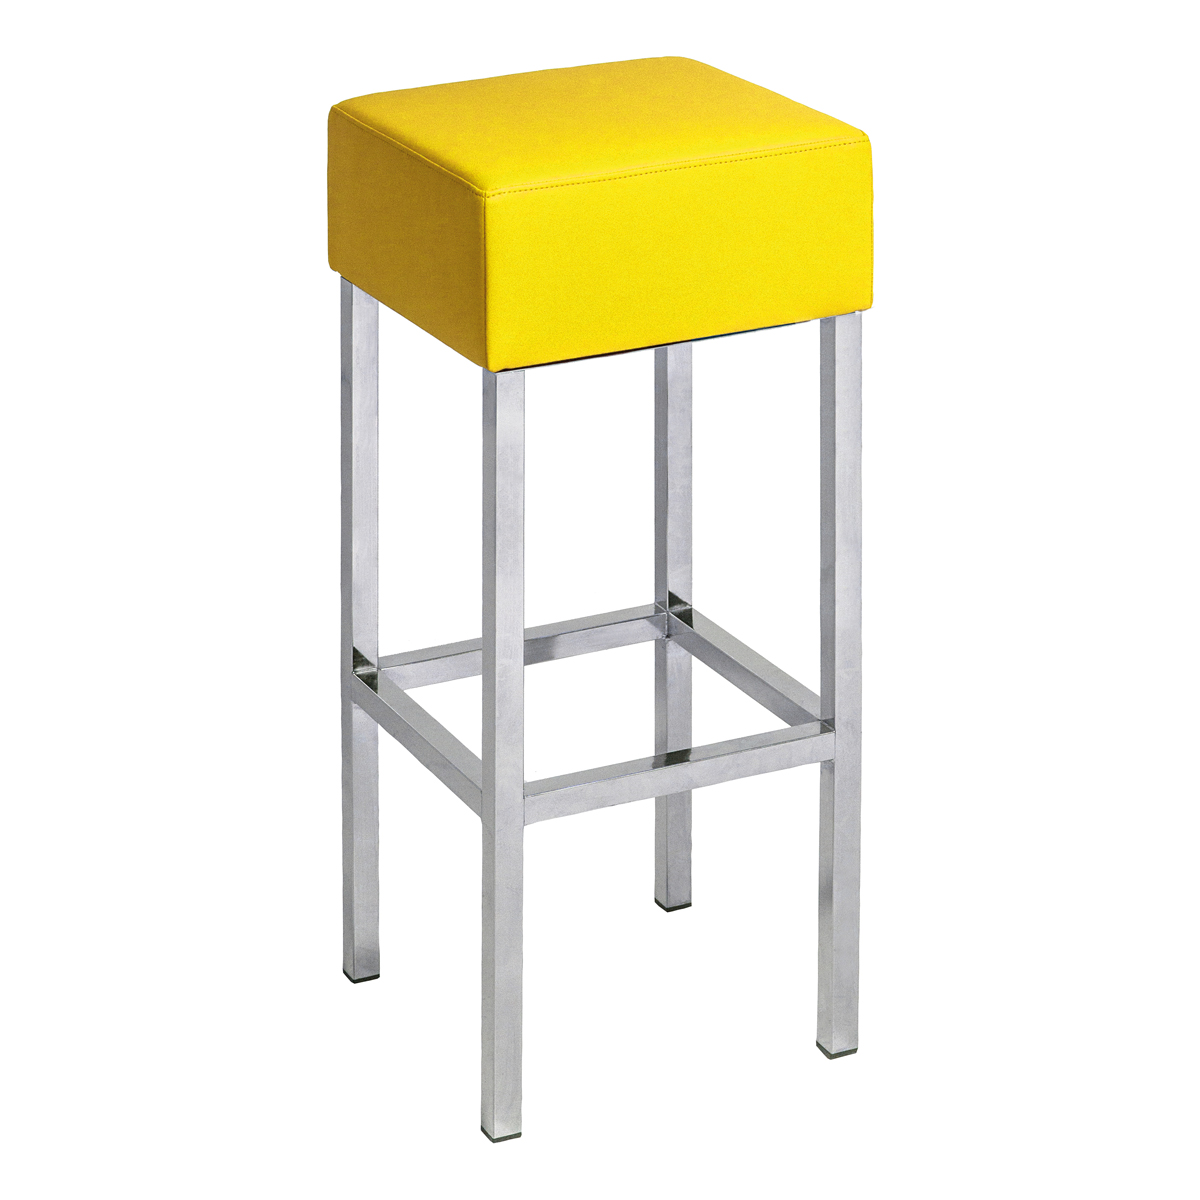 Cube gelb dlse mietm bel for Barhocker gelb